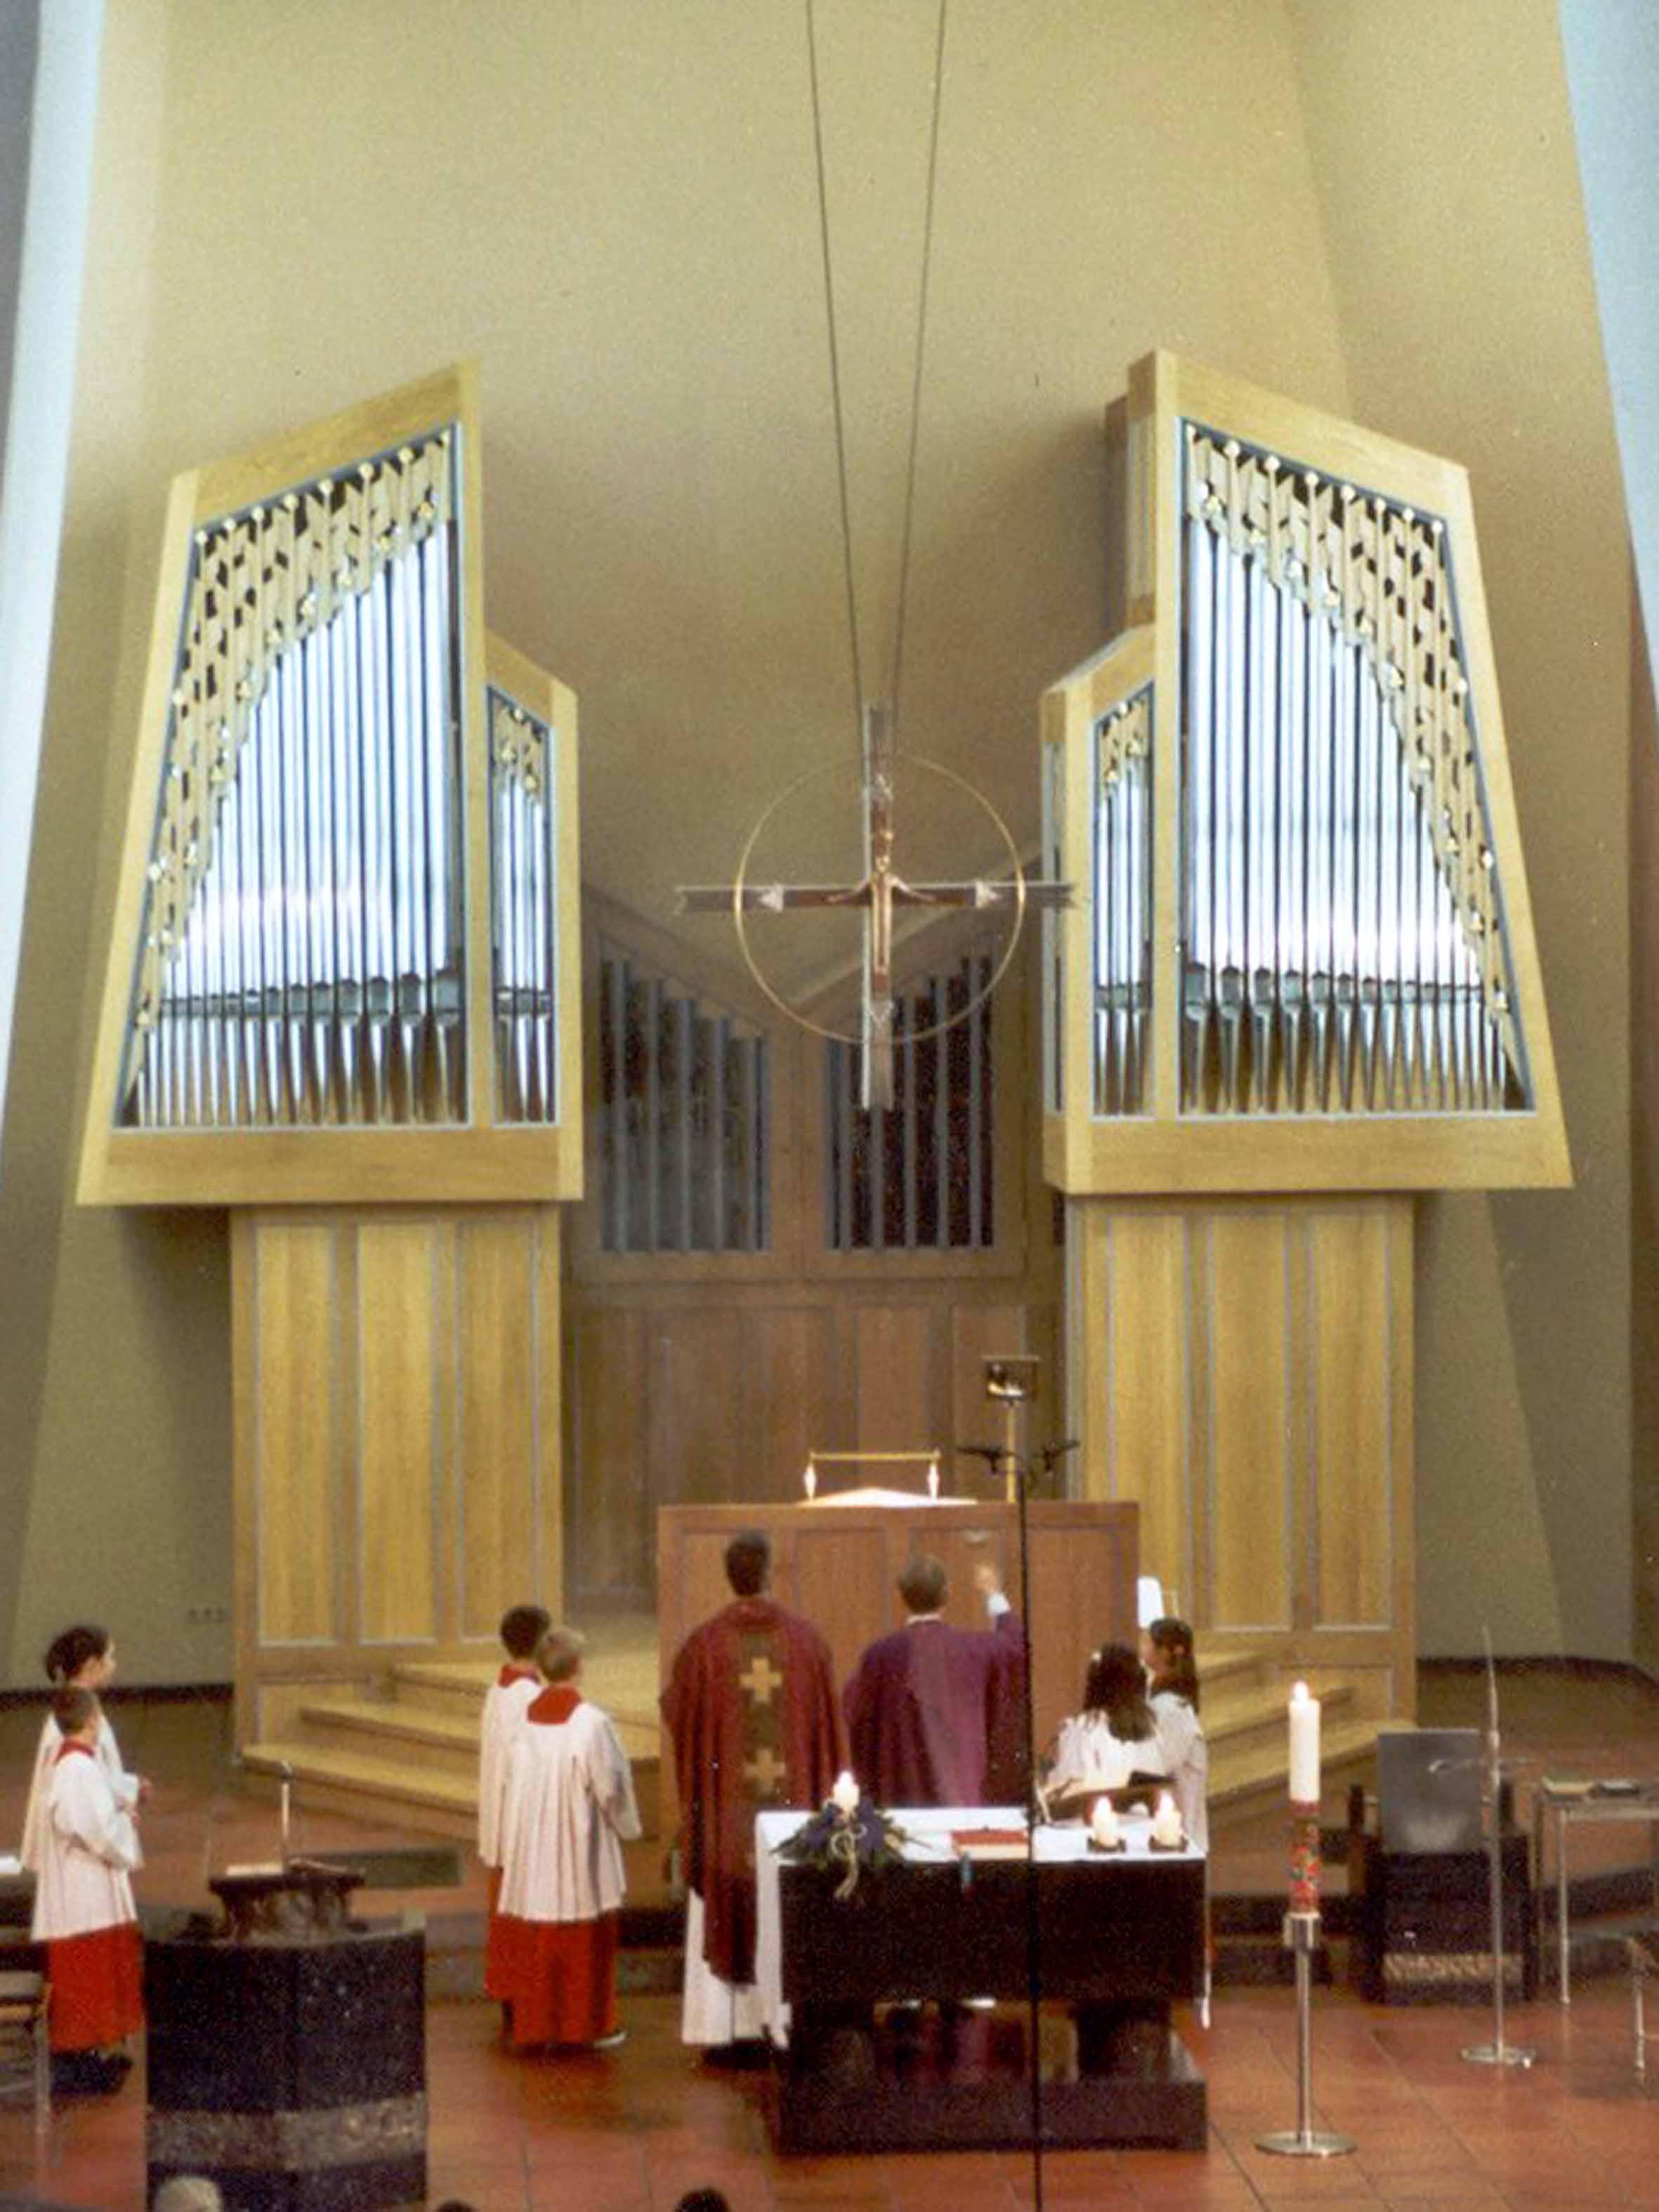 Orgelweihe 16. Dezember 2001 (Foto: E.Valerius)